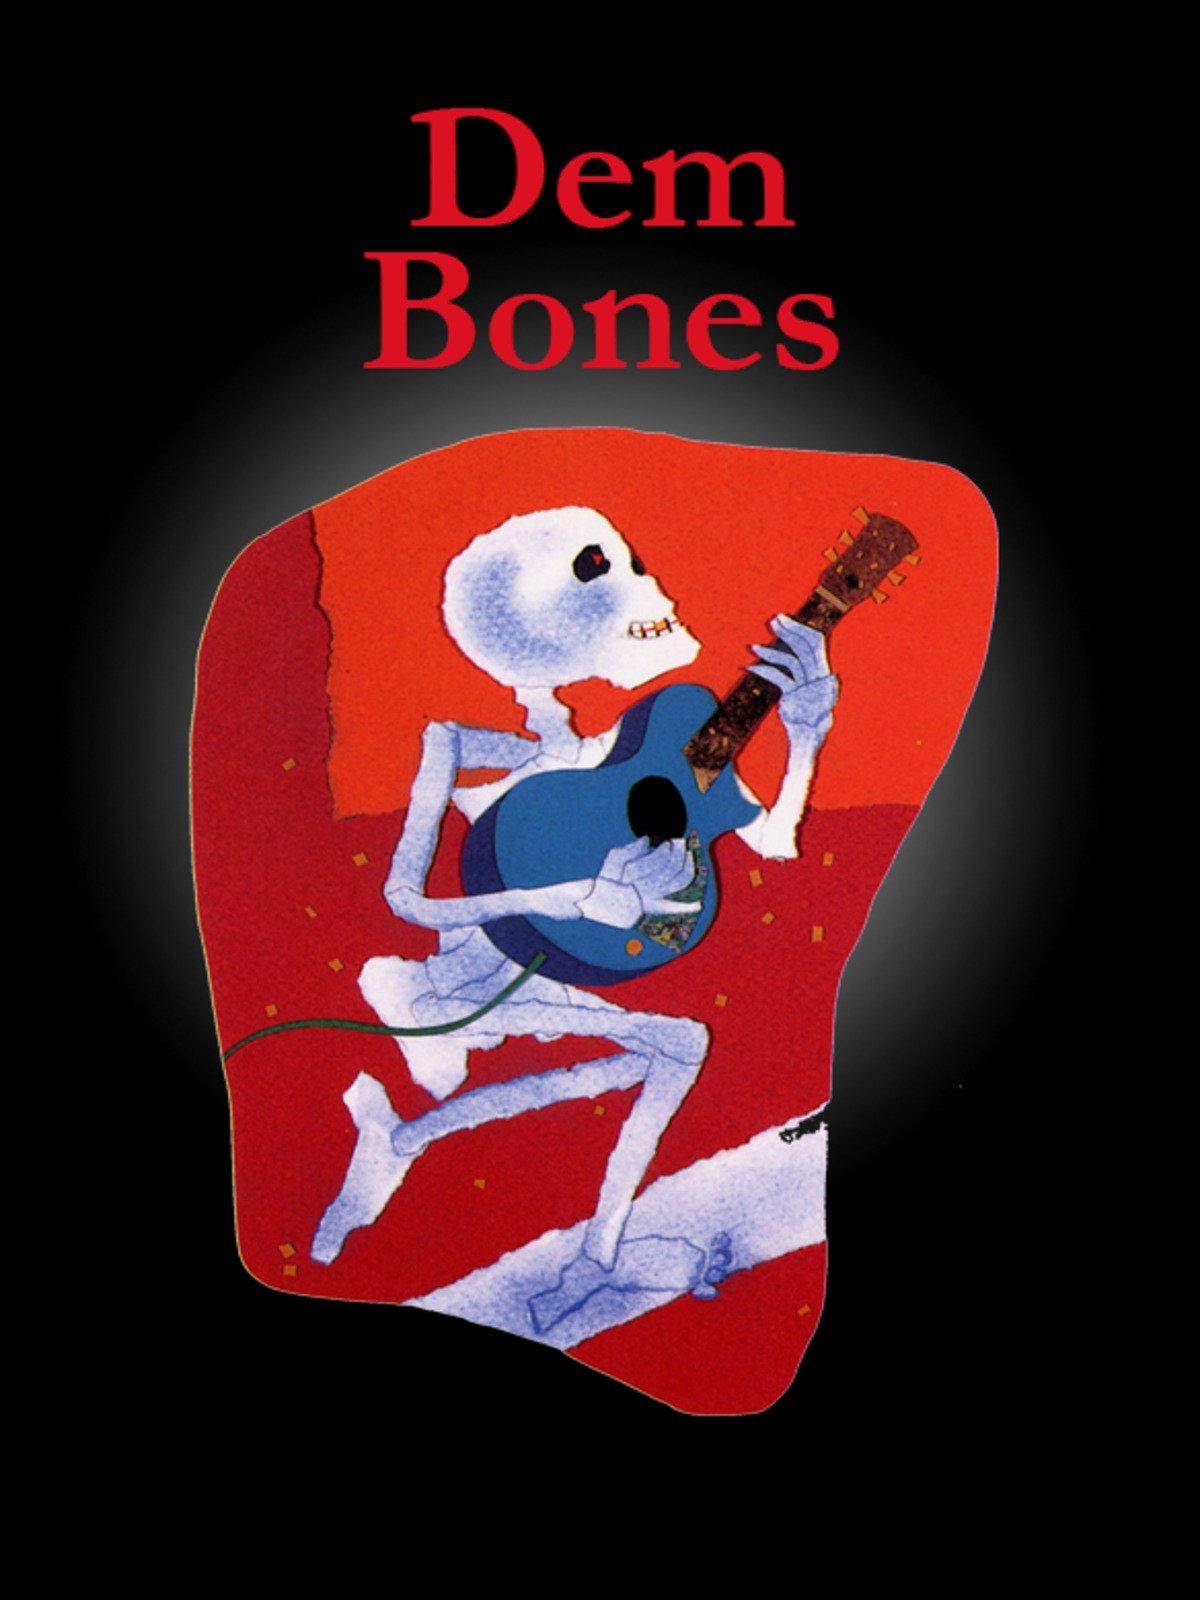 Dem Bones on Amazon Prime Video UK